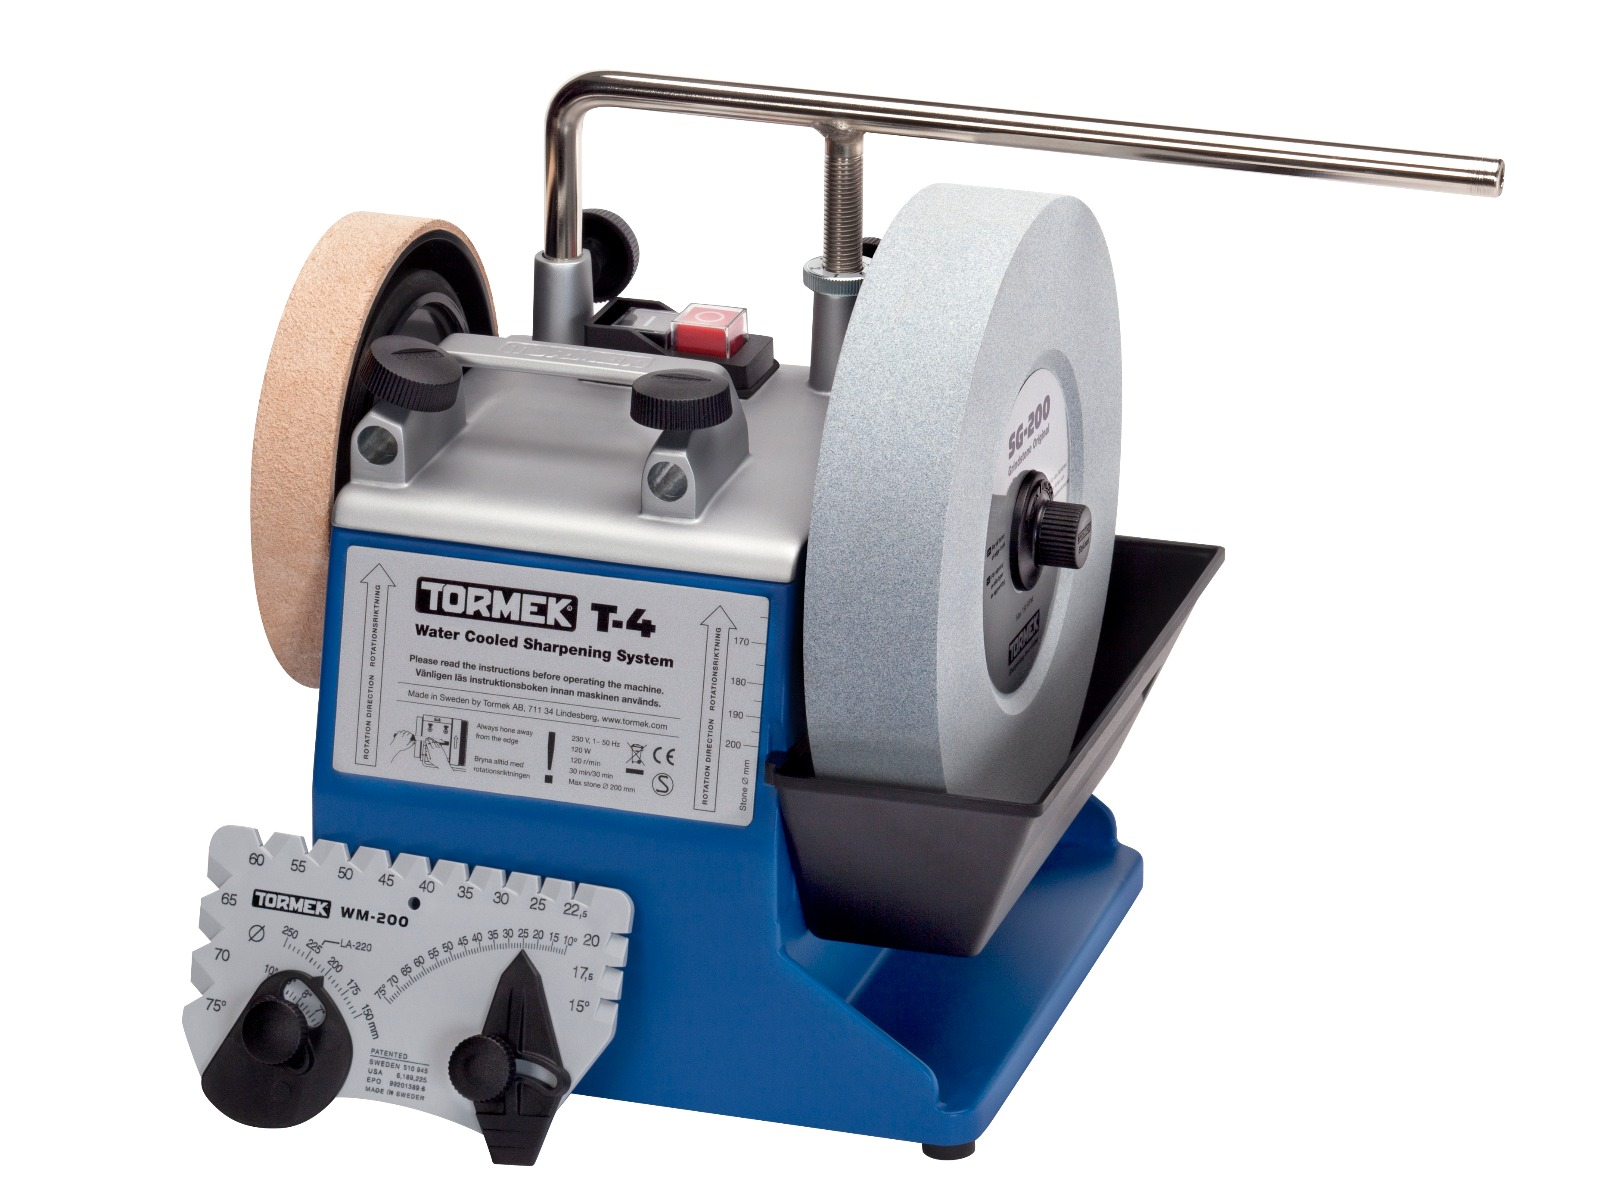 Tormek T-4 Sharpening System